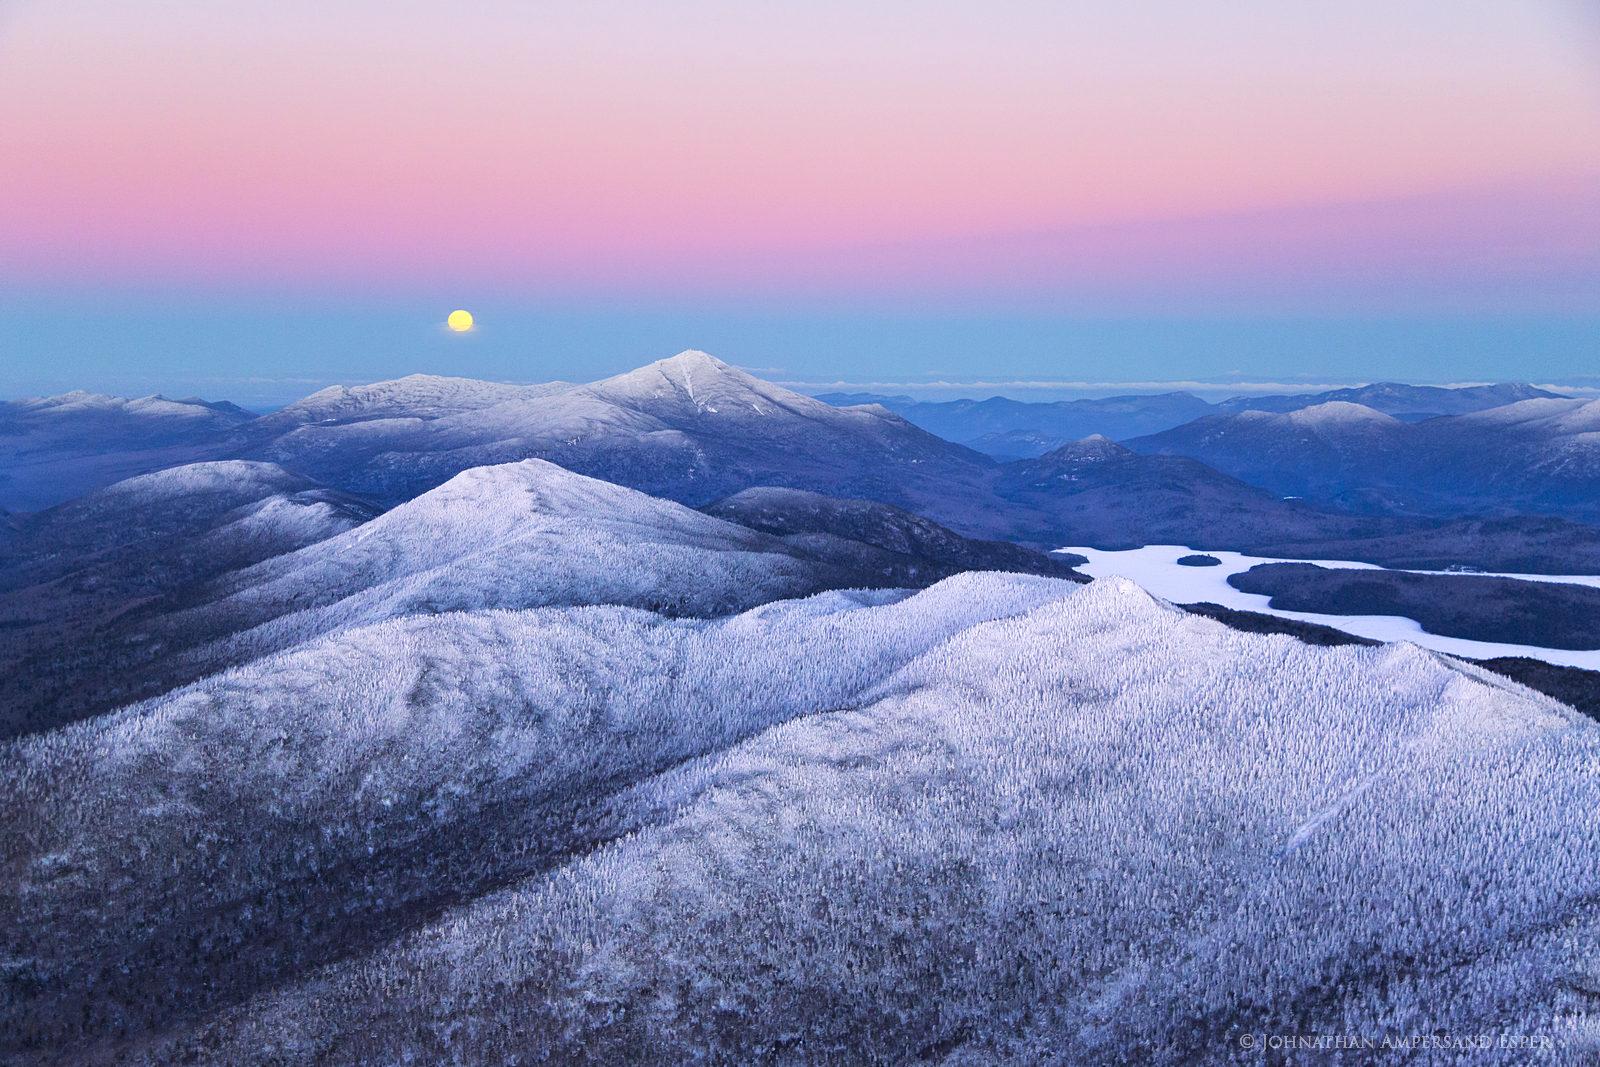 McKenzie Mt,Whiteface Mt,full moon,moon,moonrise,pink,dusk,winter,Lake Placid,High Peaks,Adirondacks,Adirondack,region,rising...